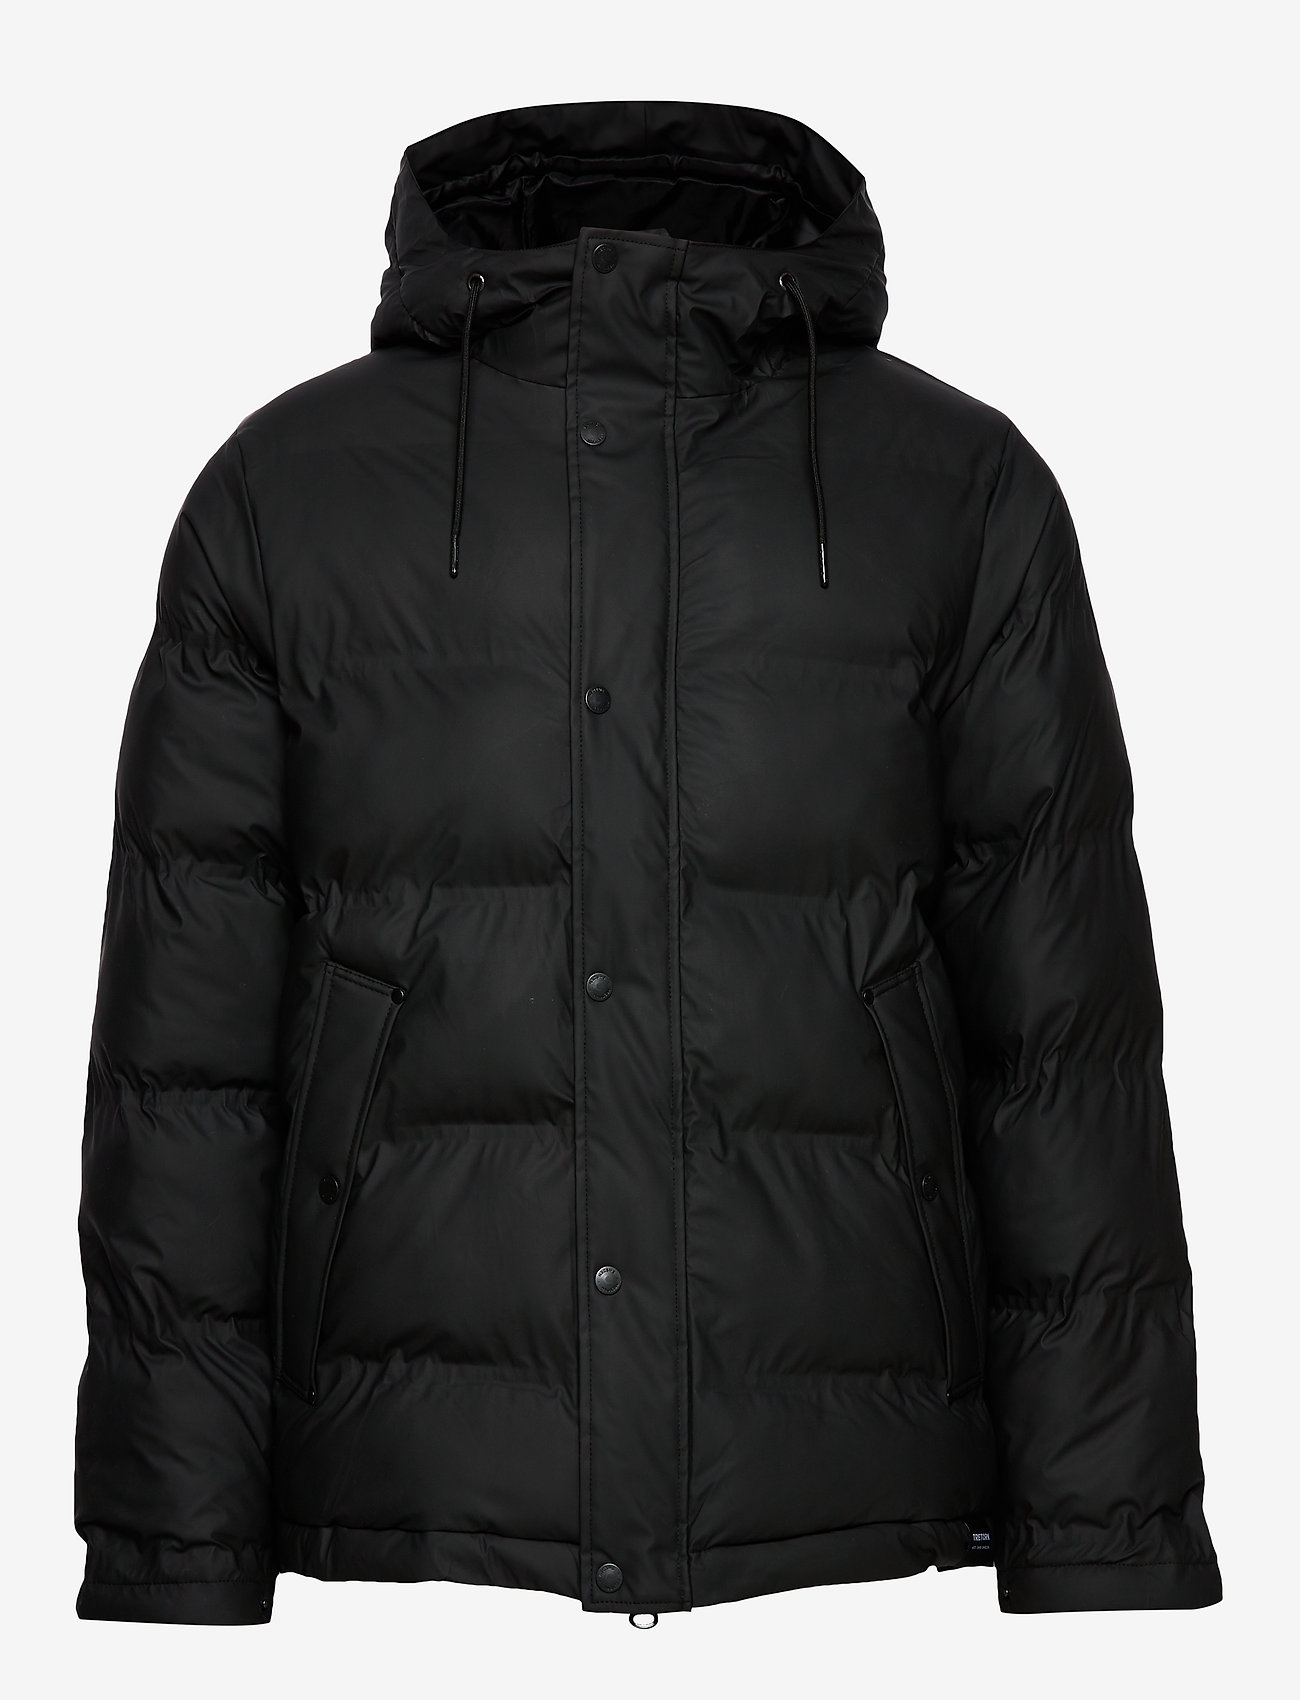 Tretorn - BAFFLE JACKET - fodrade jackor - black - 1